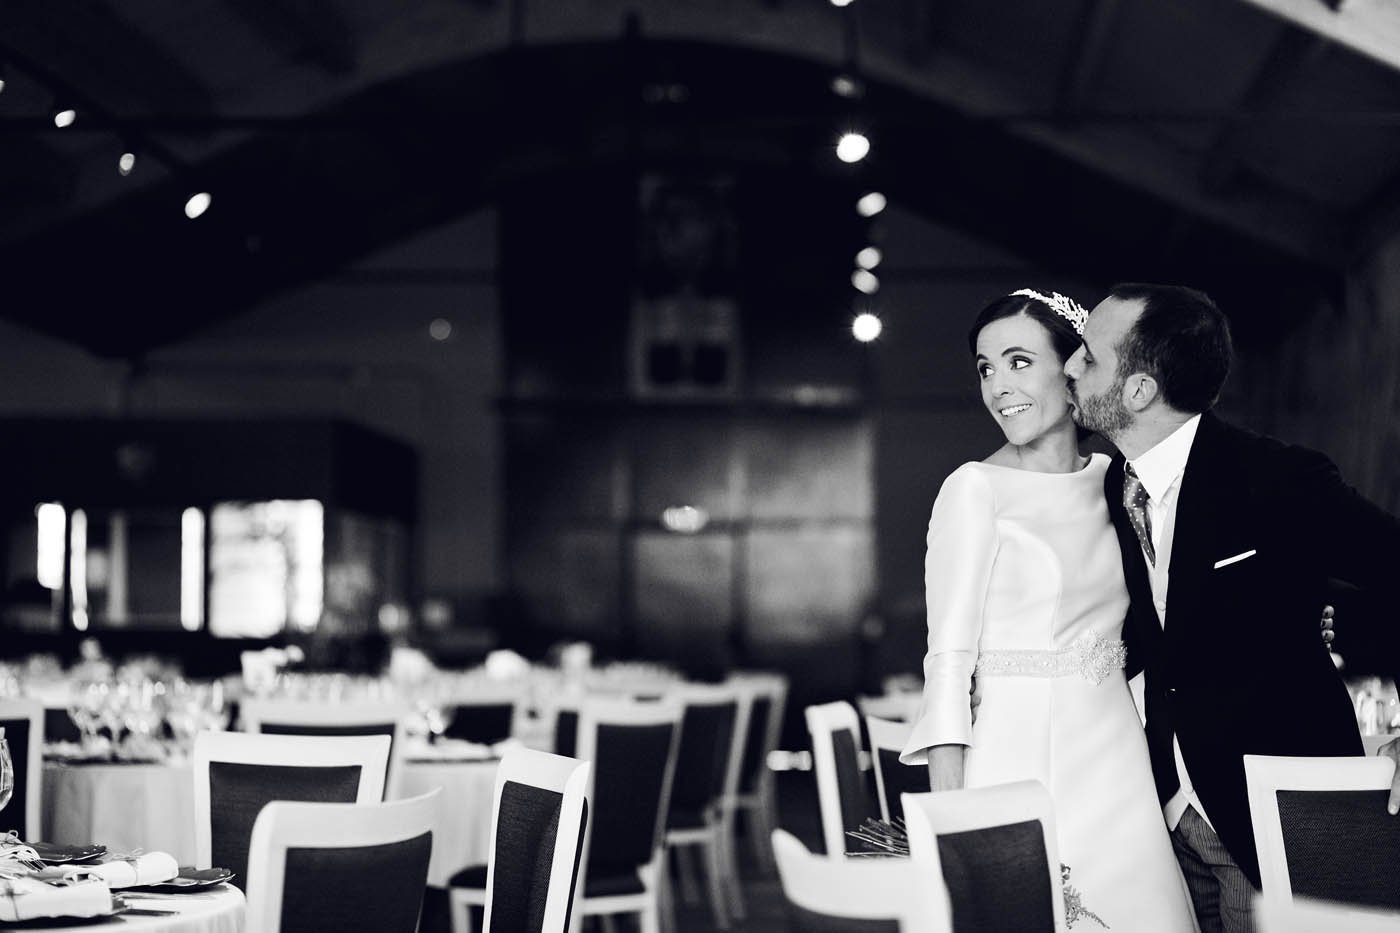 boda raquel guille-hotel eguren ugarte -paganos-alava-ivan castillo fotografia (32).jpg